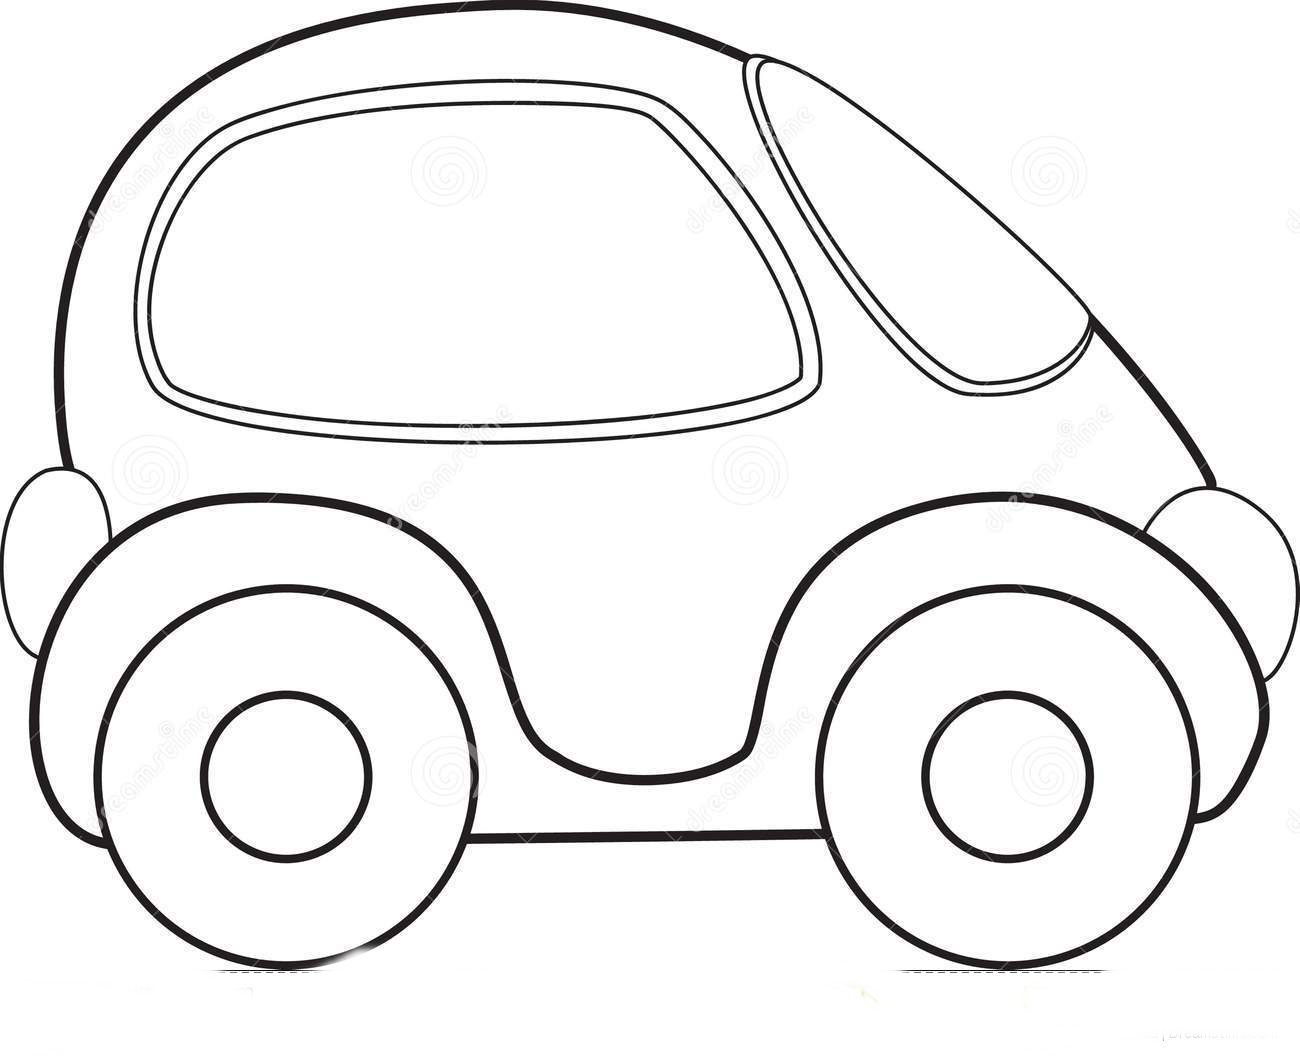 riscos graciosos  cute drawings   meios de transporte